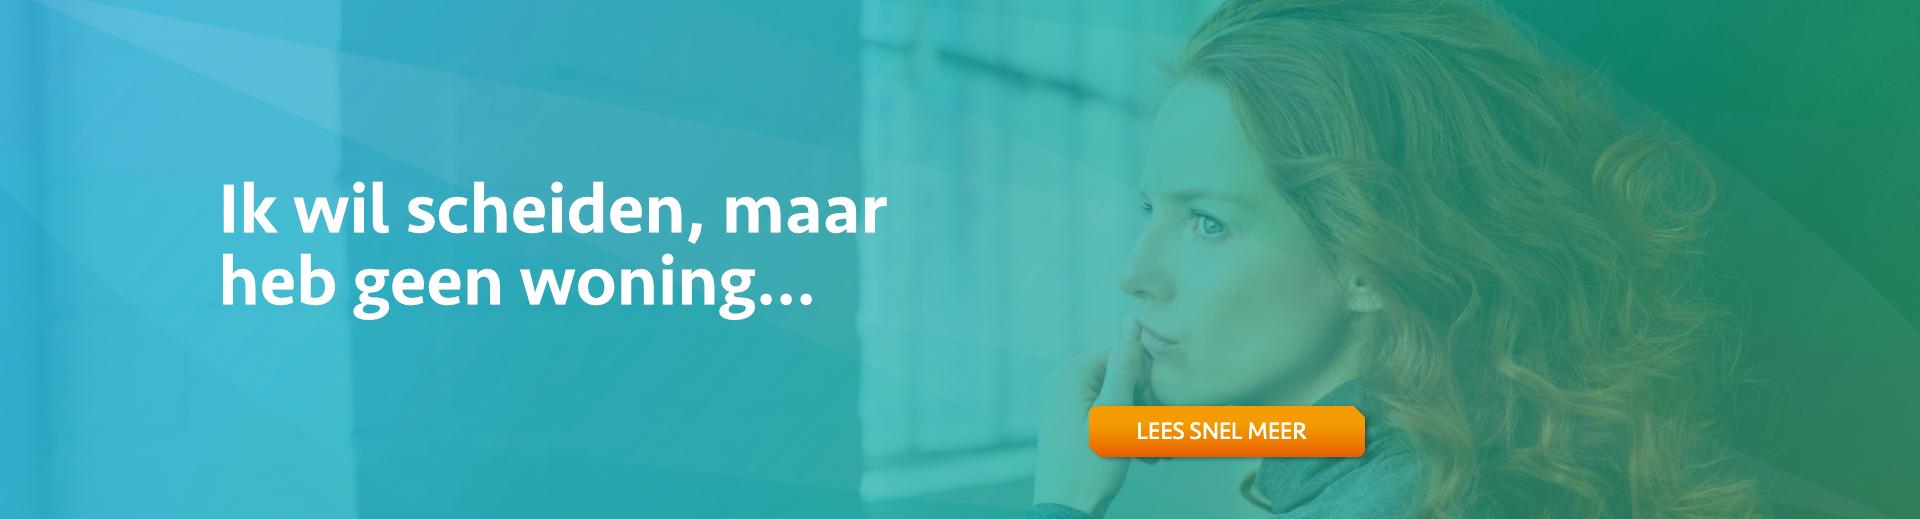 ik wil scheiden maar heb geen woning - Scheidingsplanner Midden-Nederland